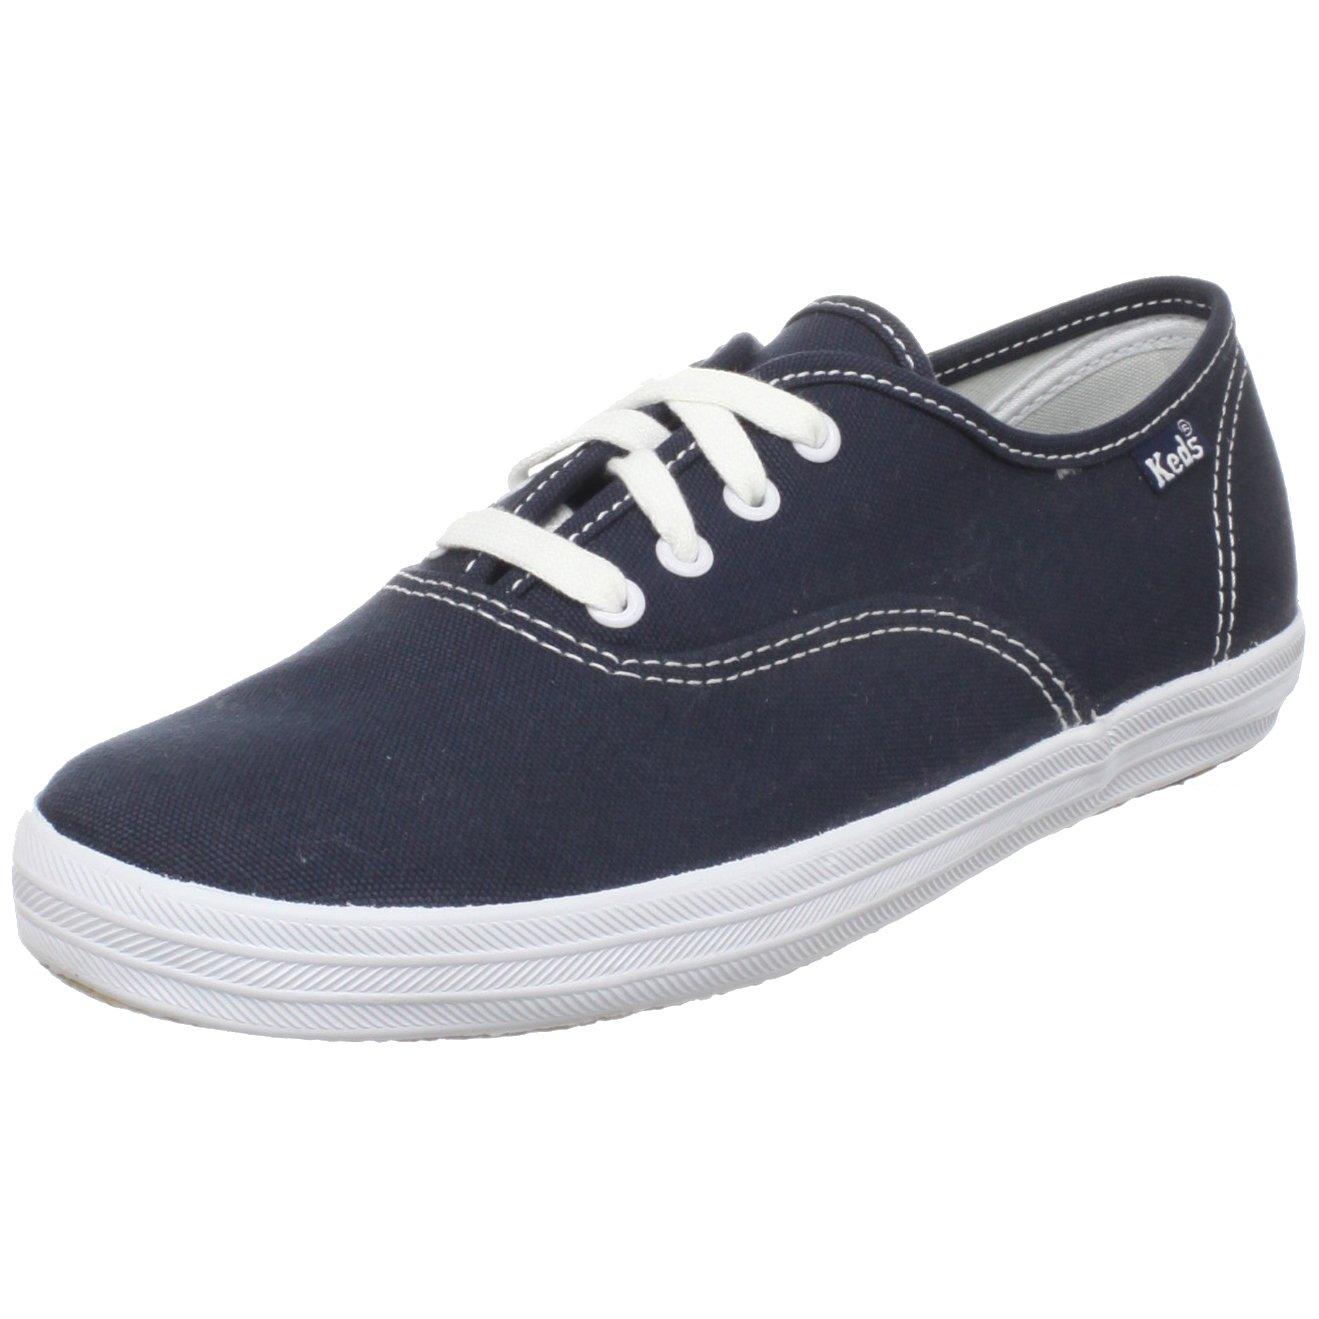 Keds Original Champion CVO Sneaker (Toddler/Little Kid/Big Kid),Navy/White,13.5 M US Little Kid by Keds (Image #1)